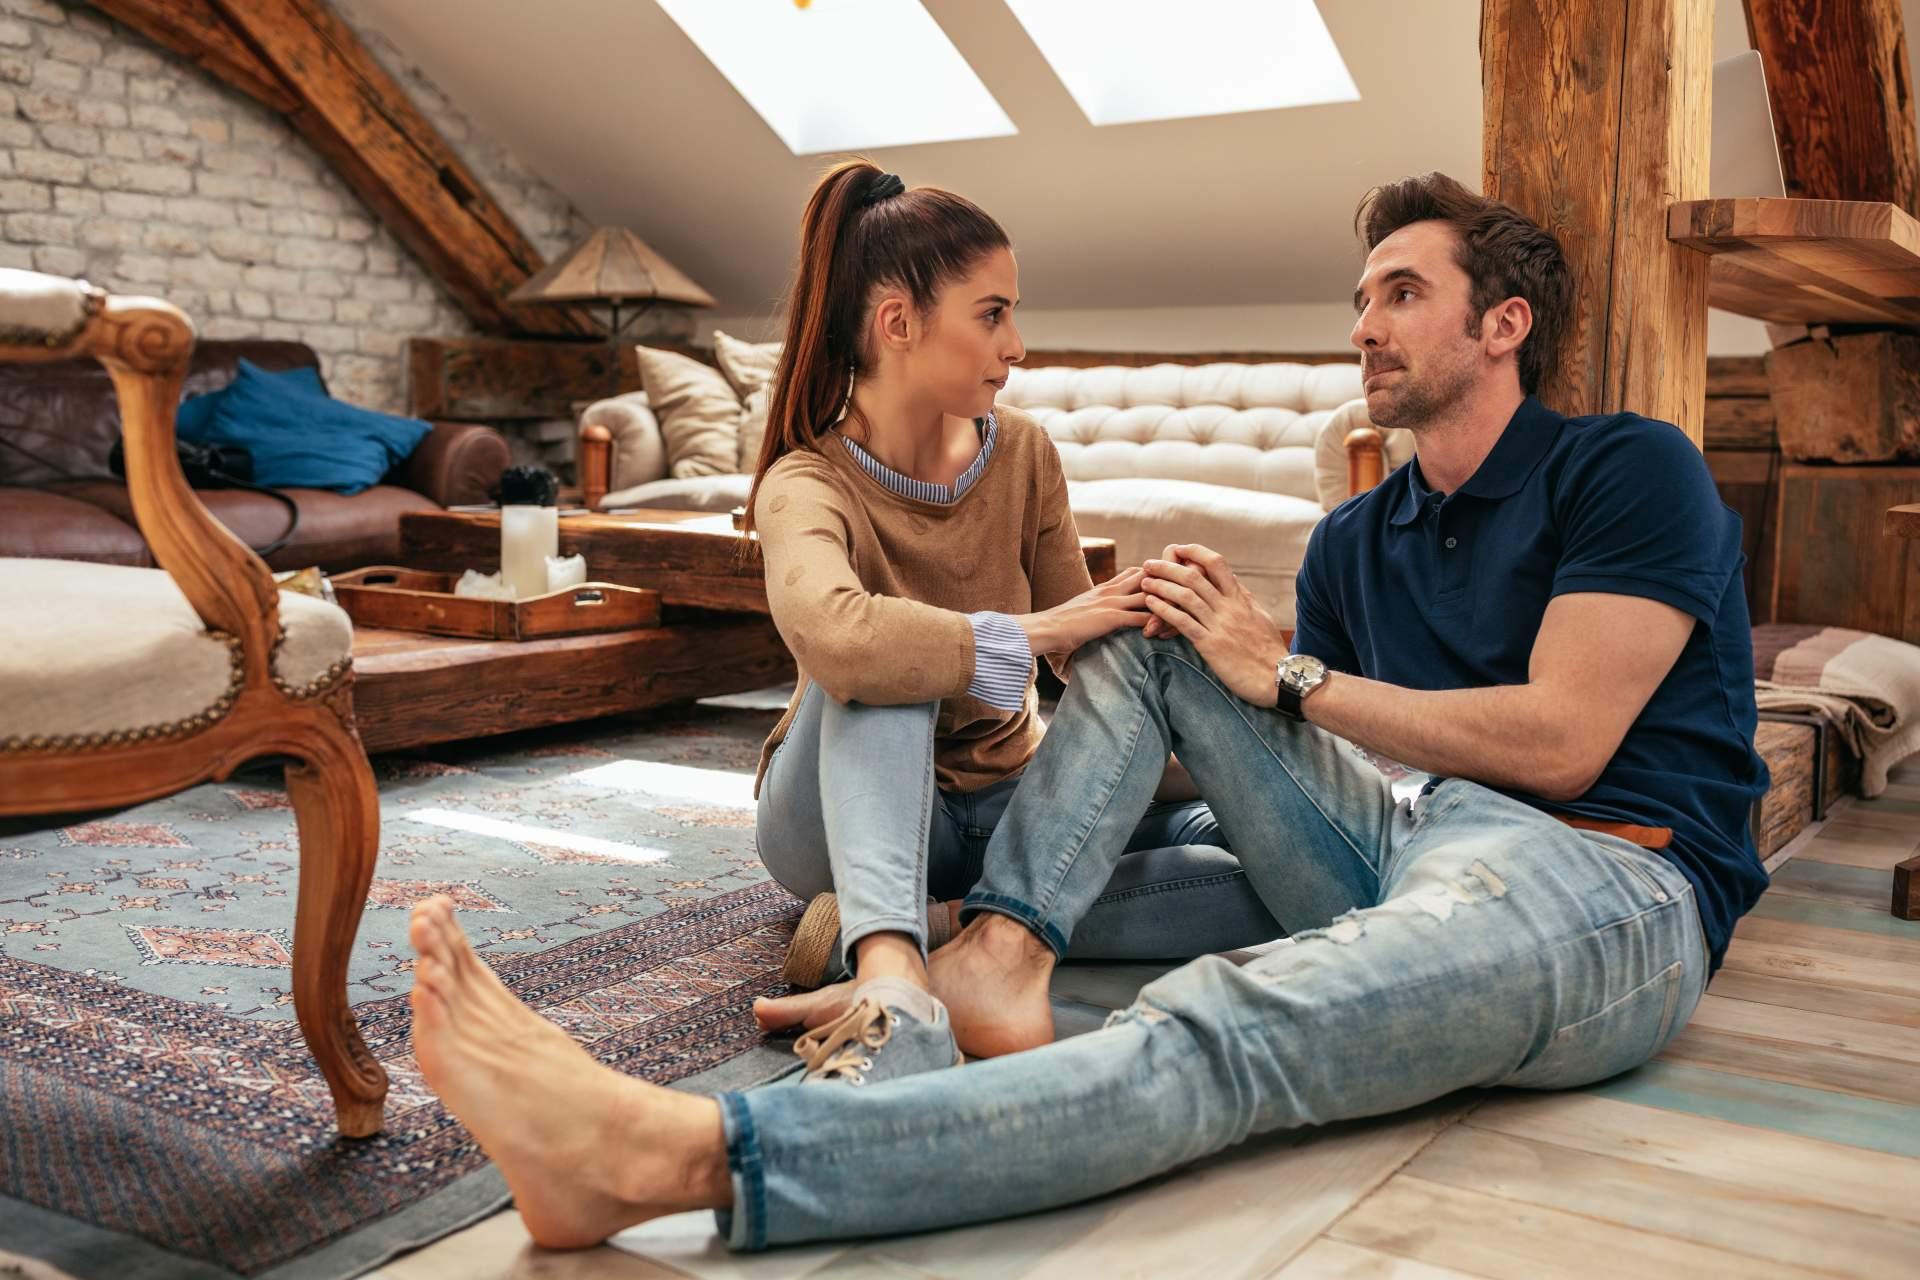 Swingers Open Lifestyle Couple Consent Conversation